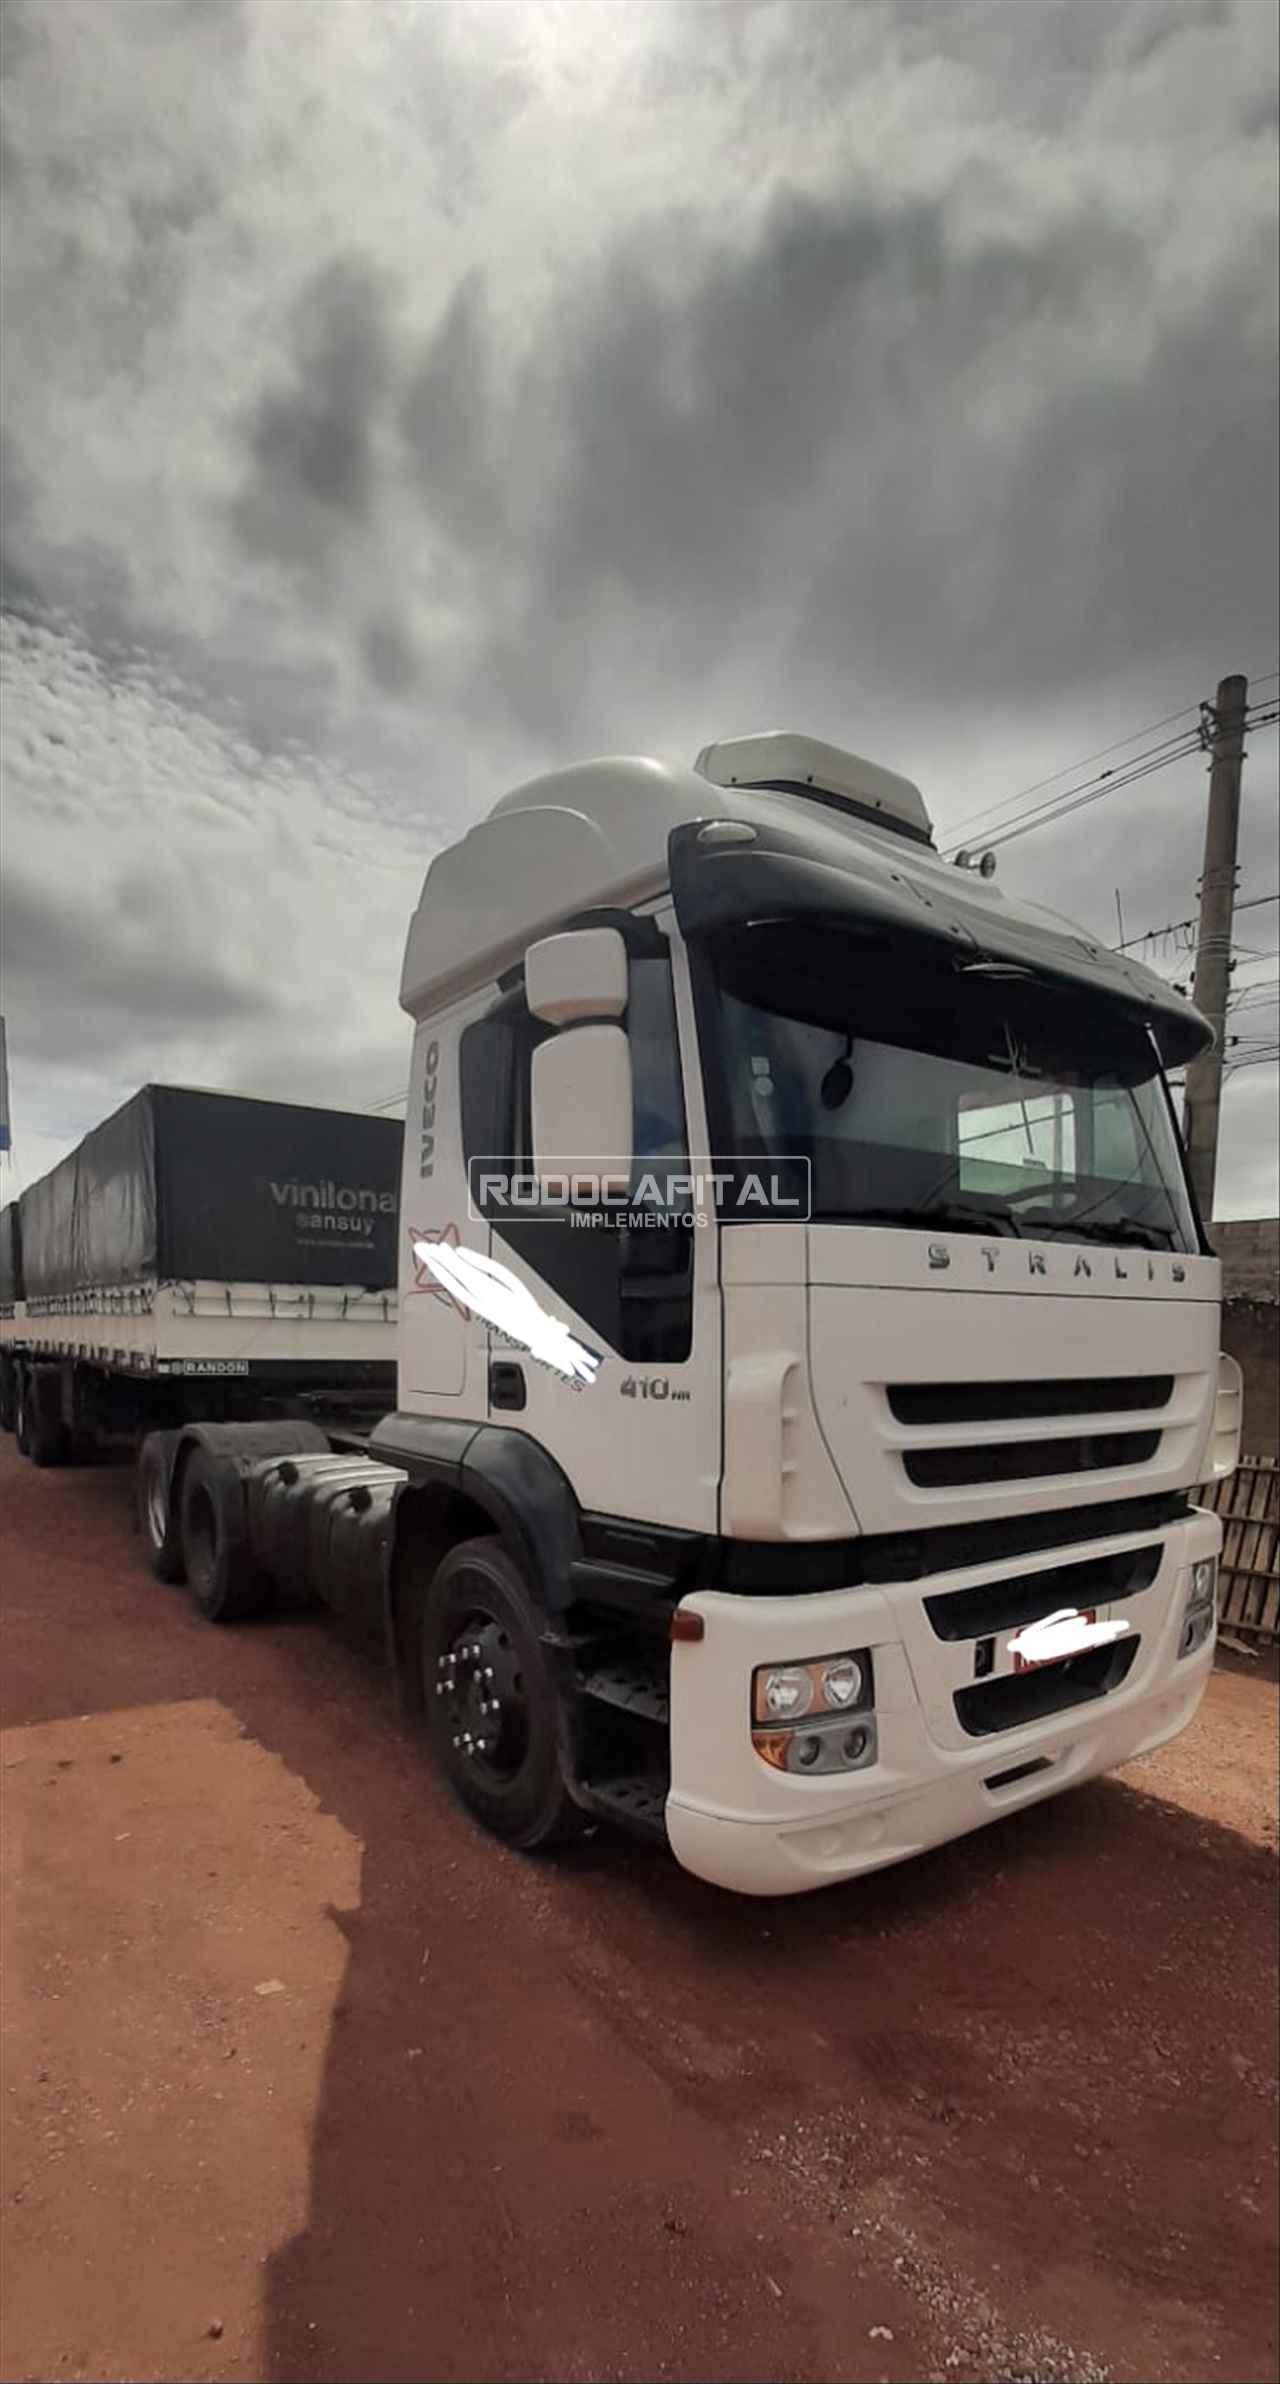 CAMINHAO IVECO STRALIS 410 Cavalo Mecânico Truck 6x2 RODOCAPITAL - TRUCKVAN BRASILIA DISTRITO FEDERAL DF